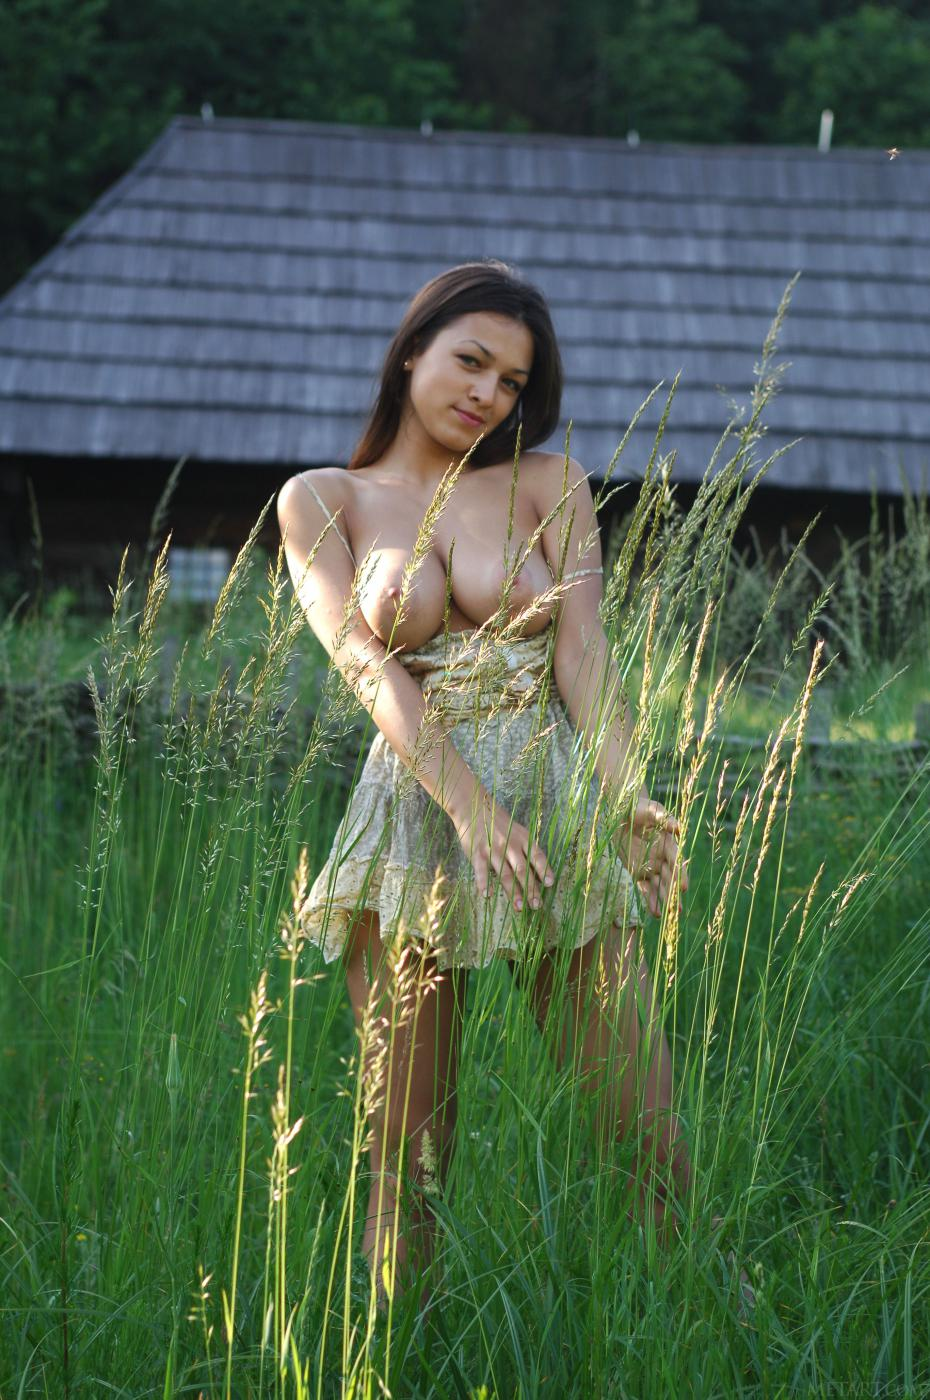 Met-Art представляет галерею с девушкой Sofi A